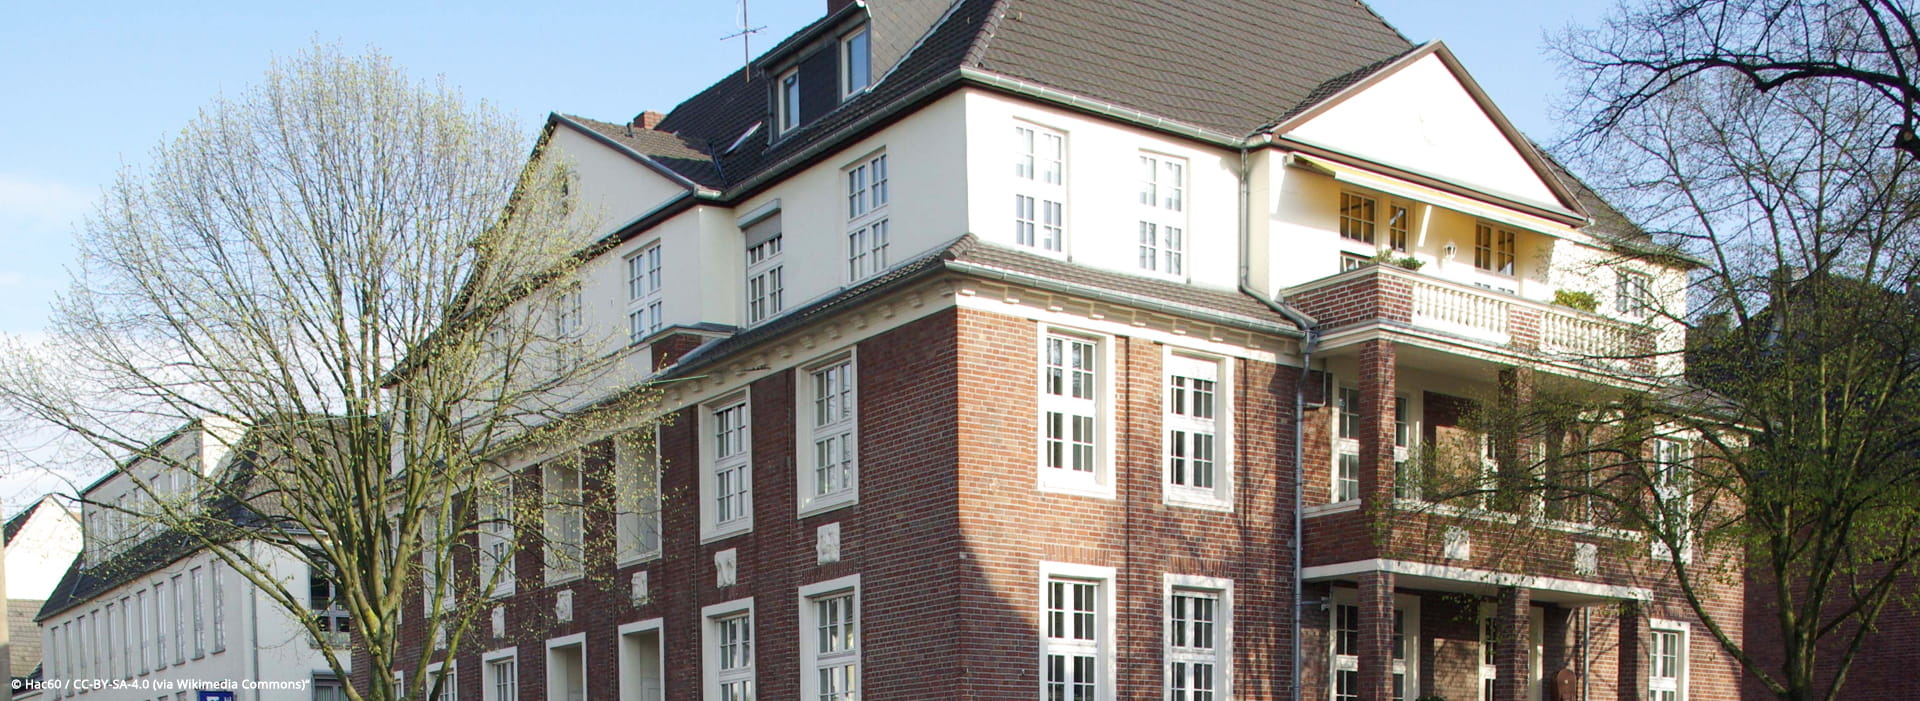 Goost Immobilien | Braunsfeld